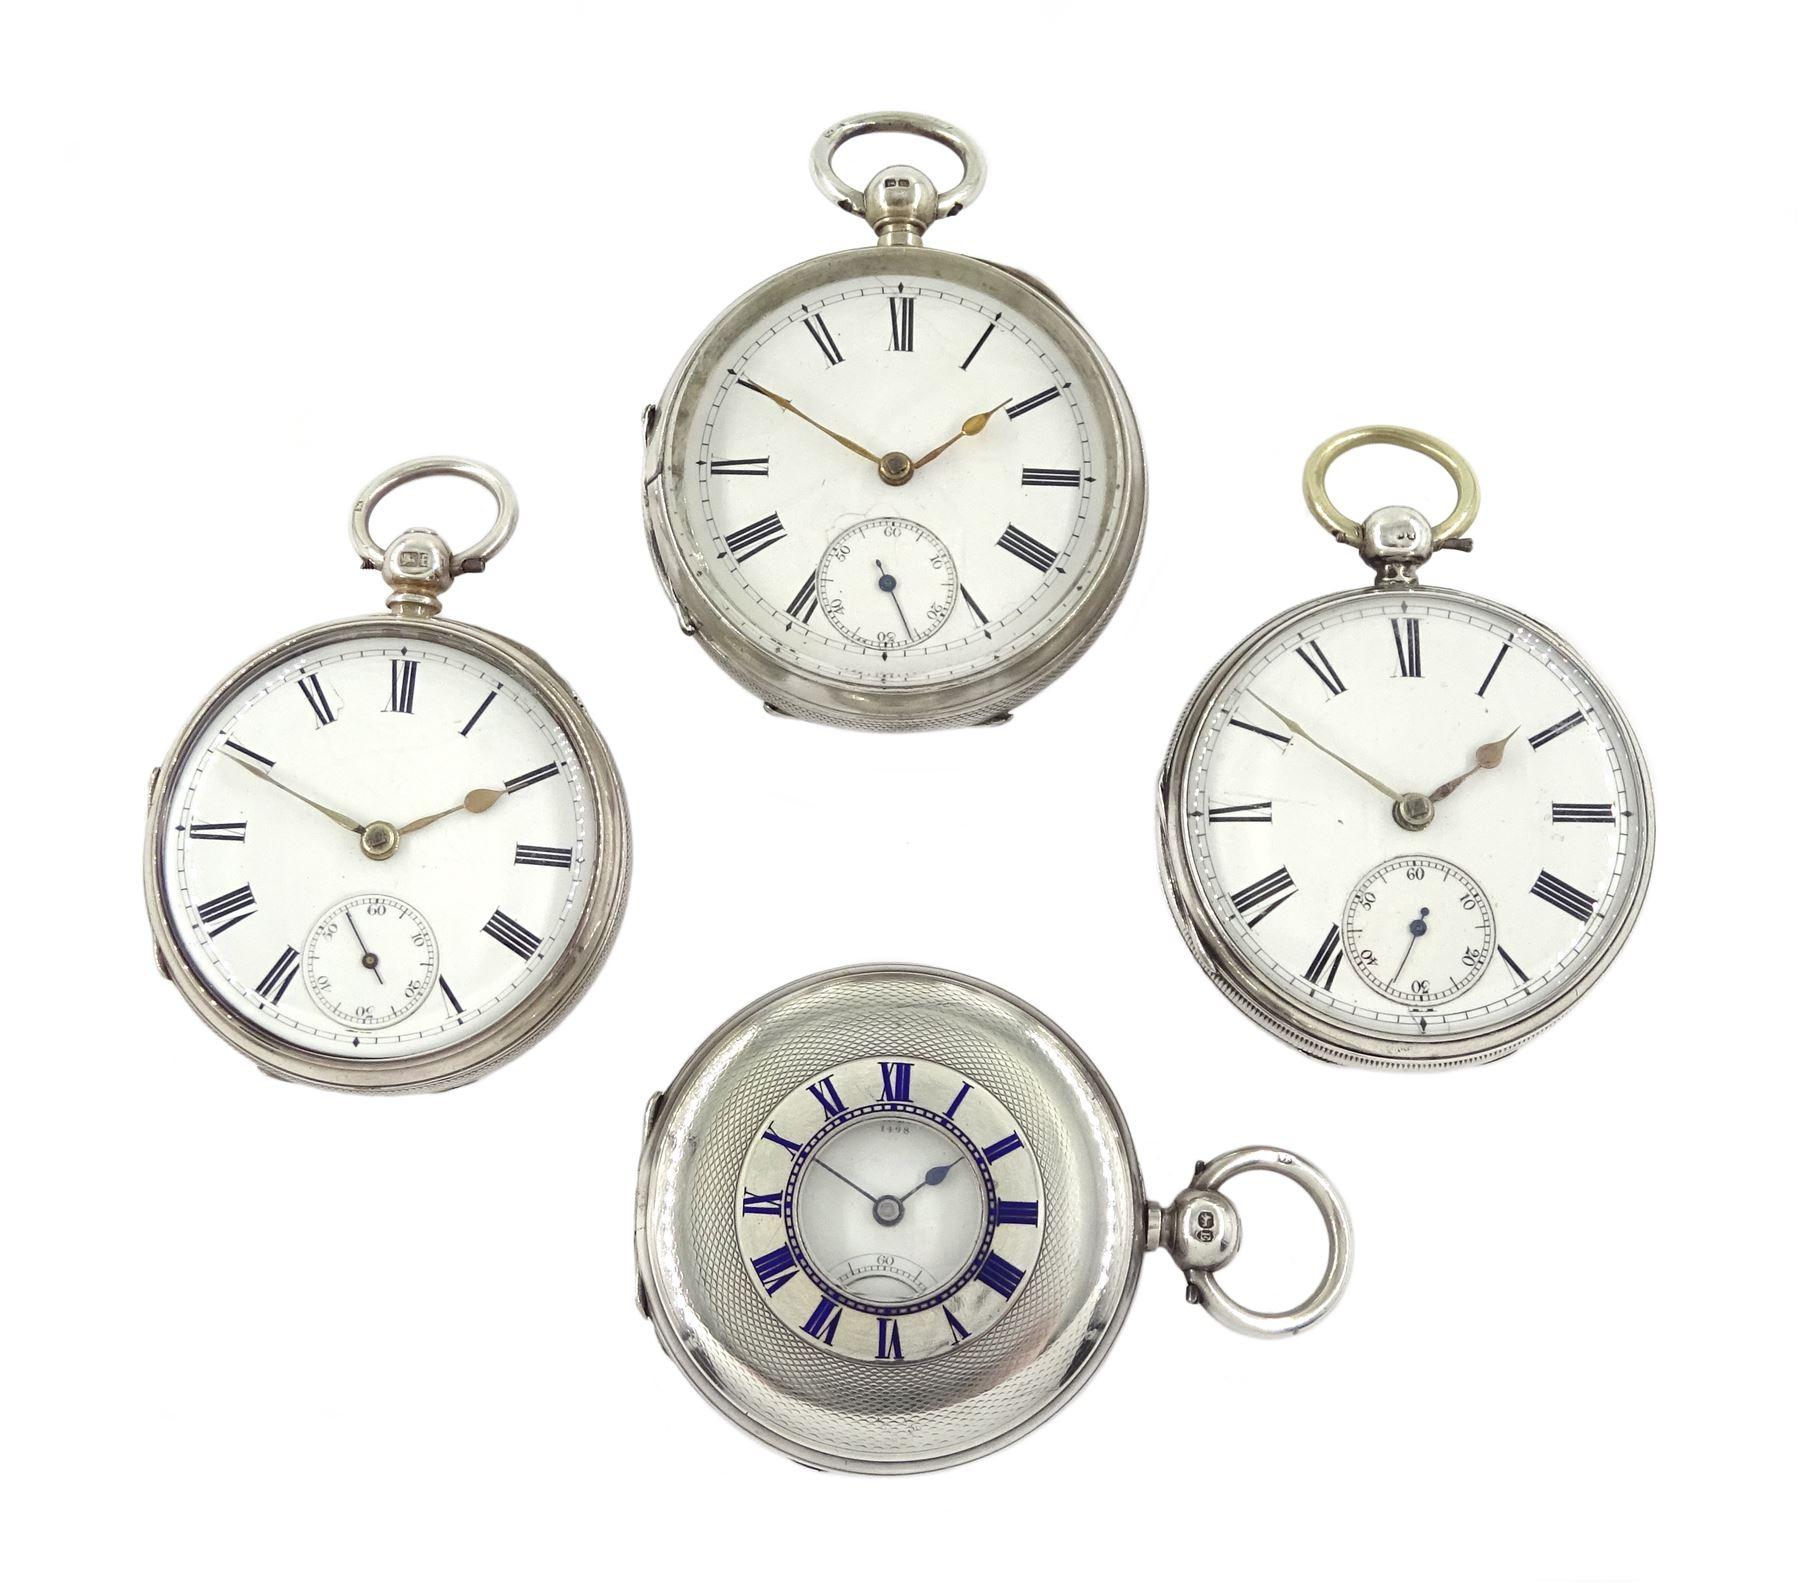 Victorian silver half hunter lever fusee presentation pocket watch by Robert H Halford, silver open